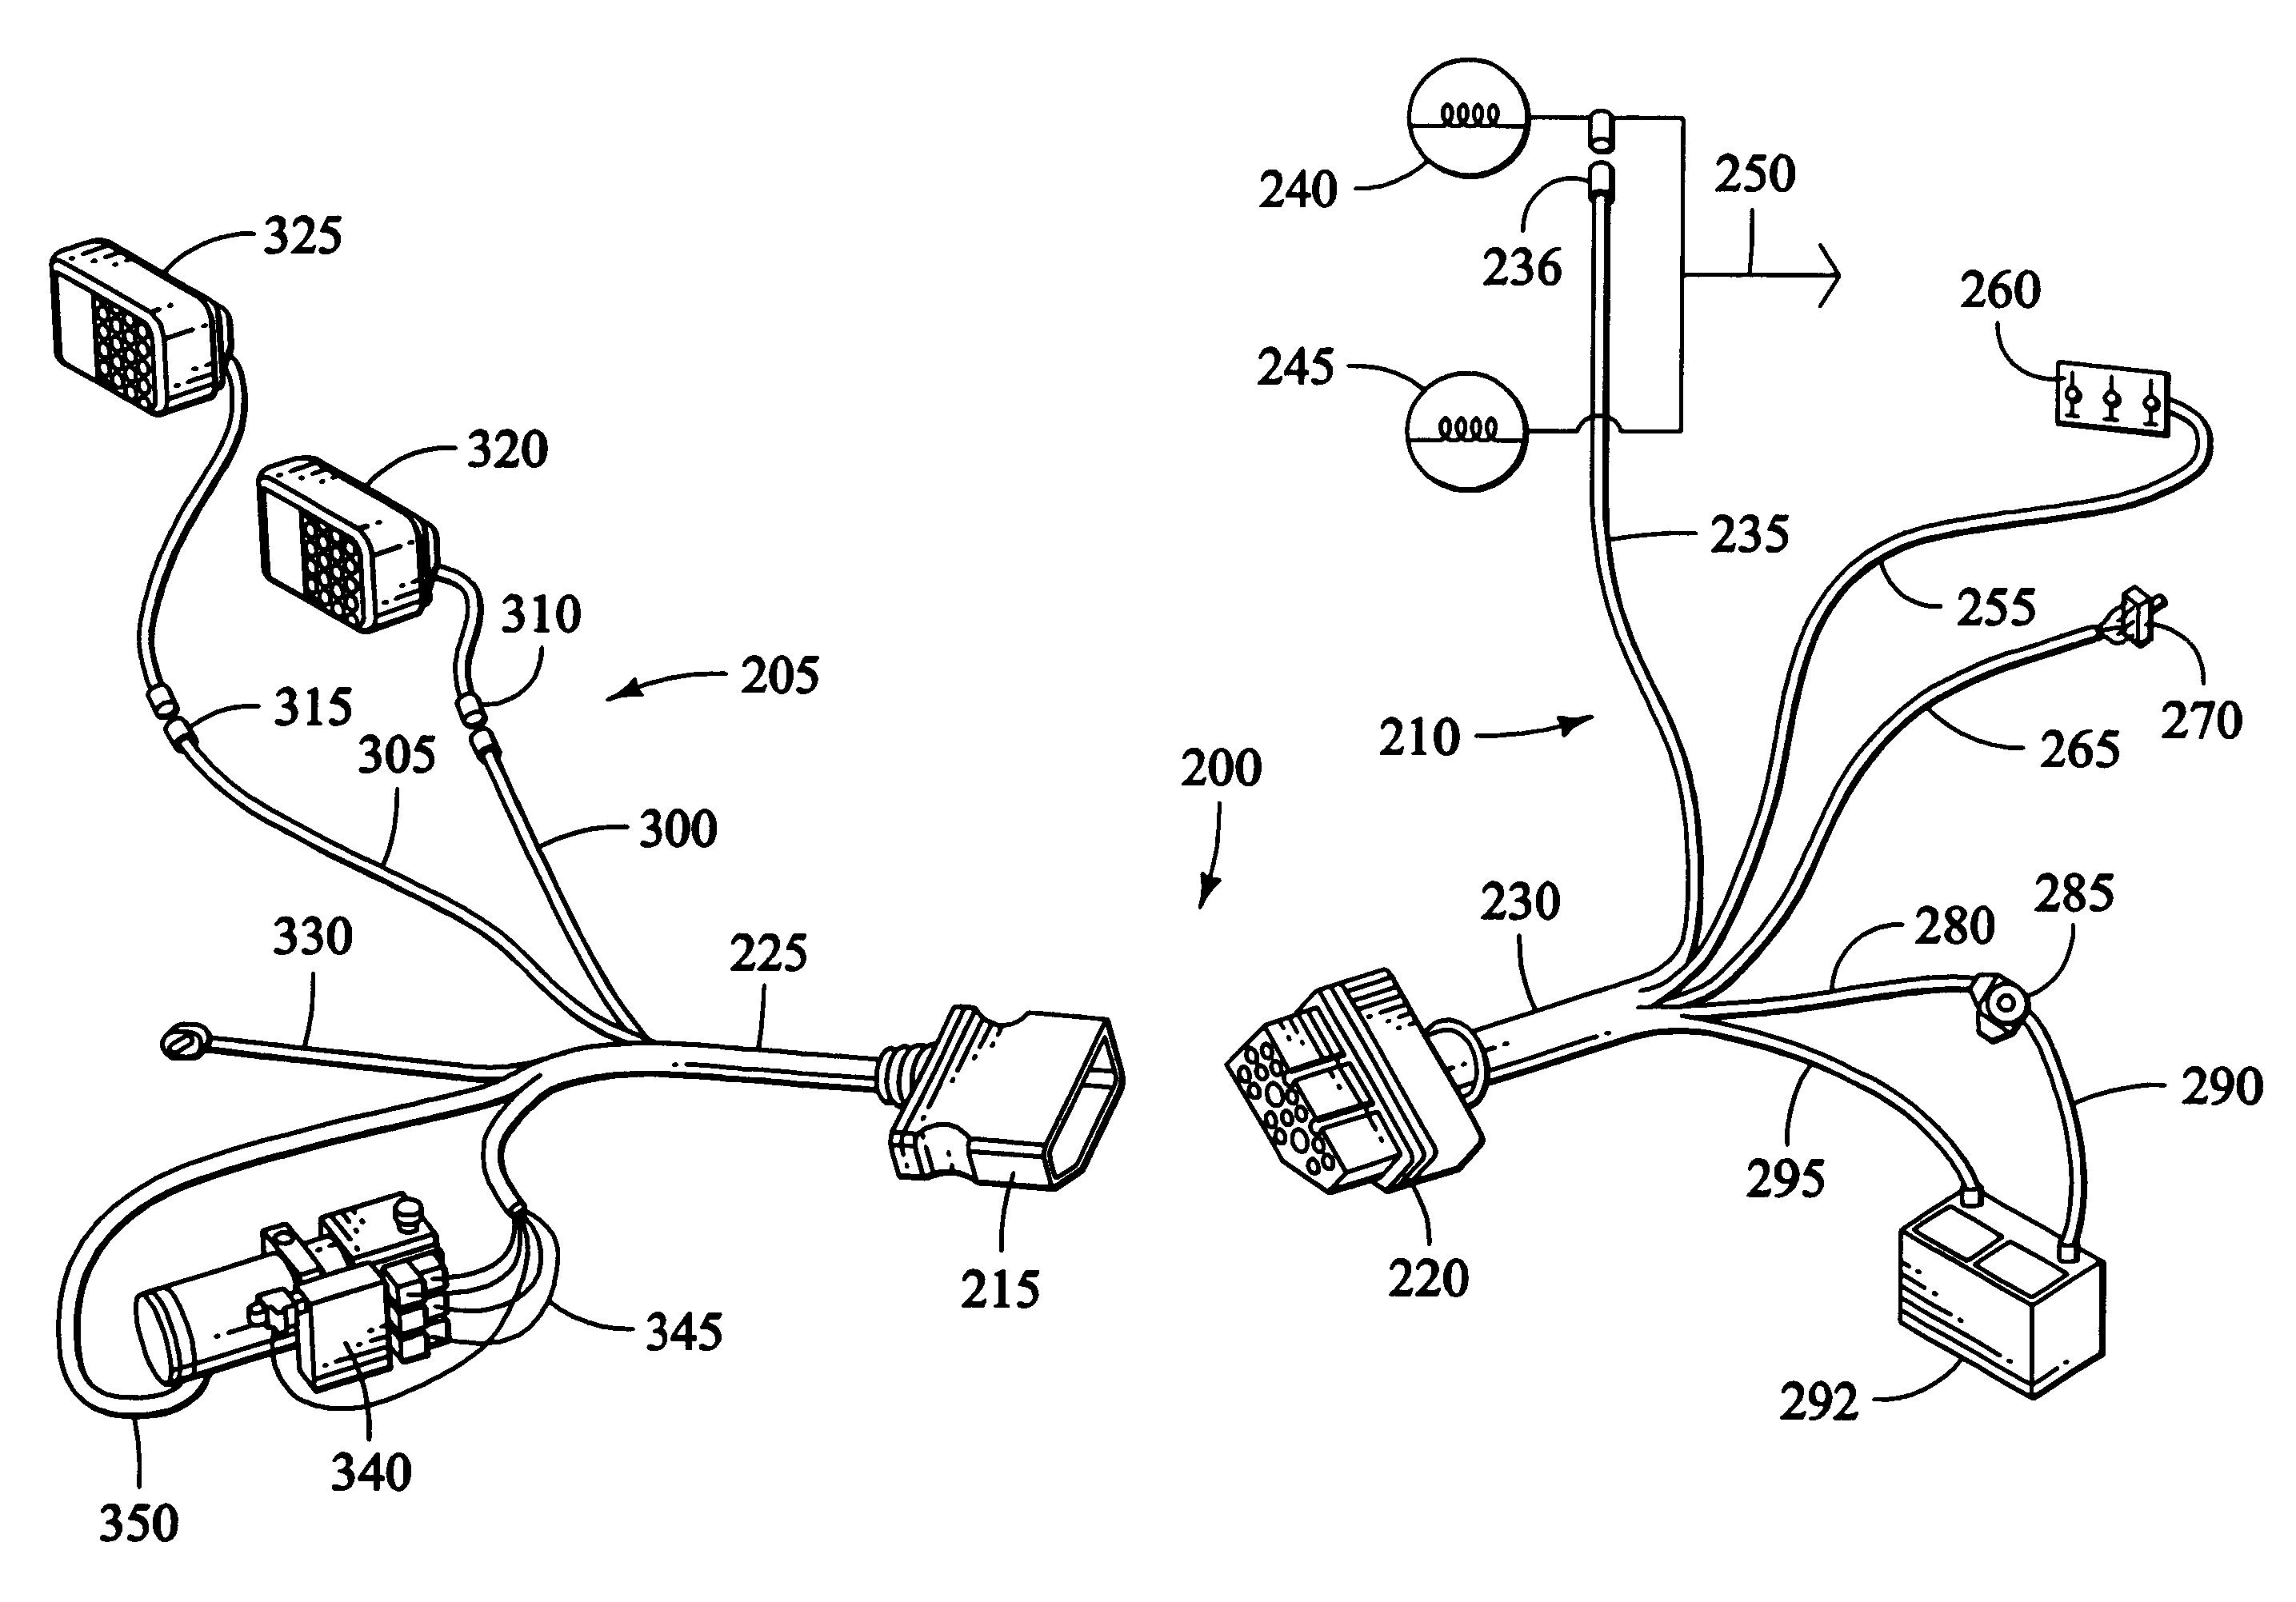 meyers plow wiring diagram plow free printable wiring diagrams